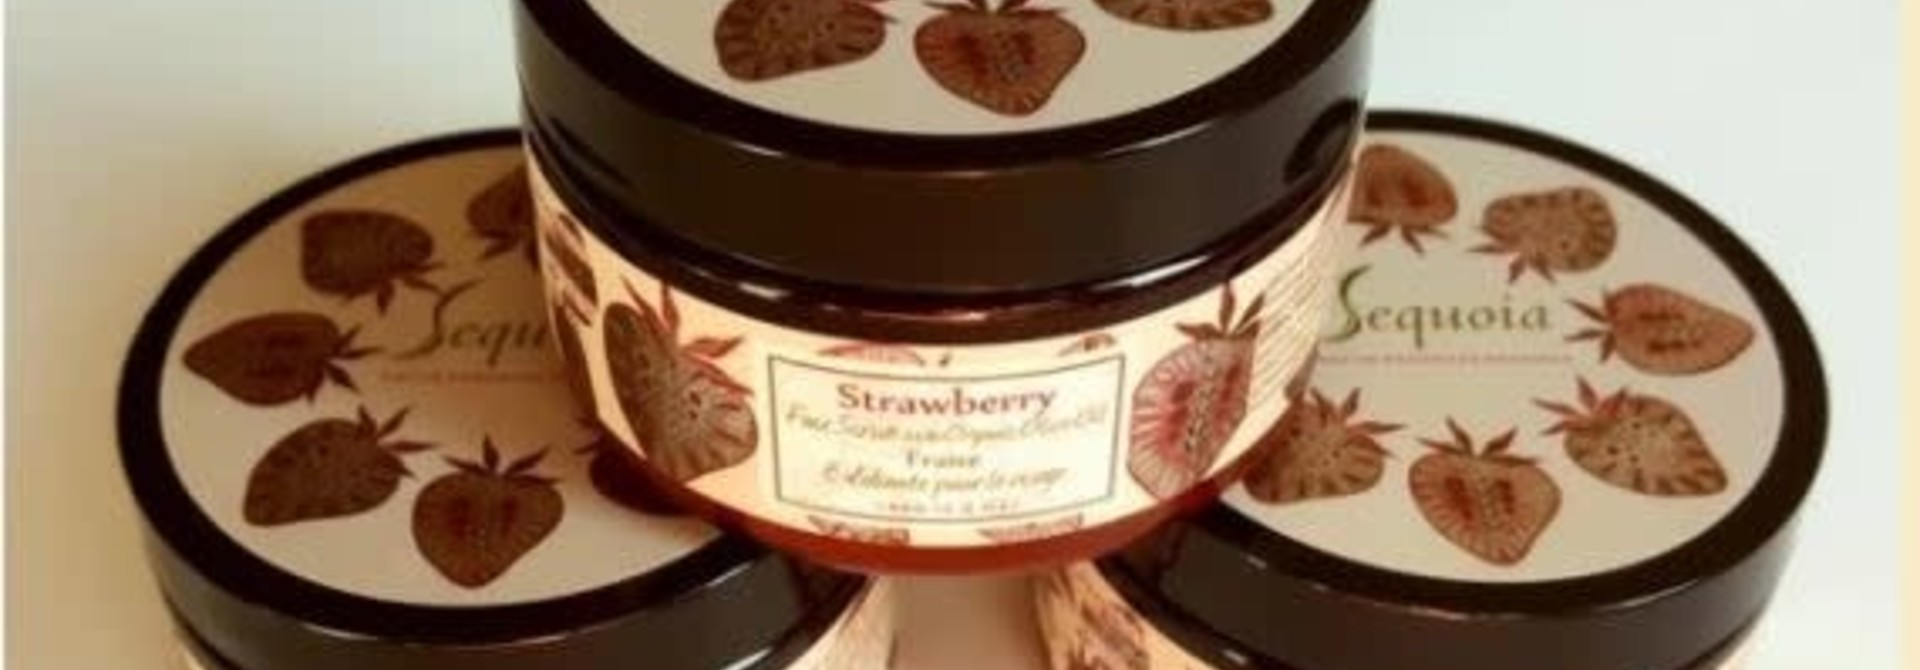 Sequoia Strawberry Facial Scrub 5oz